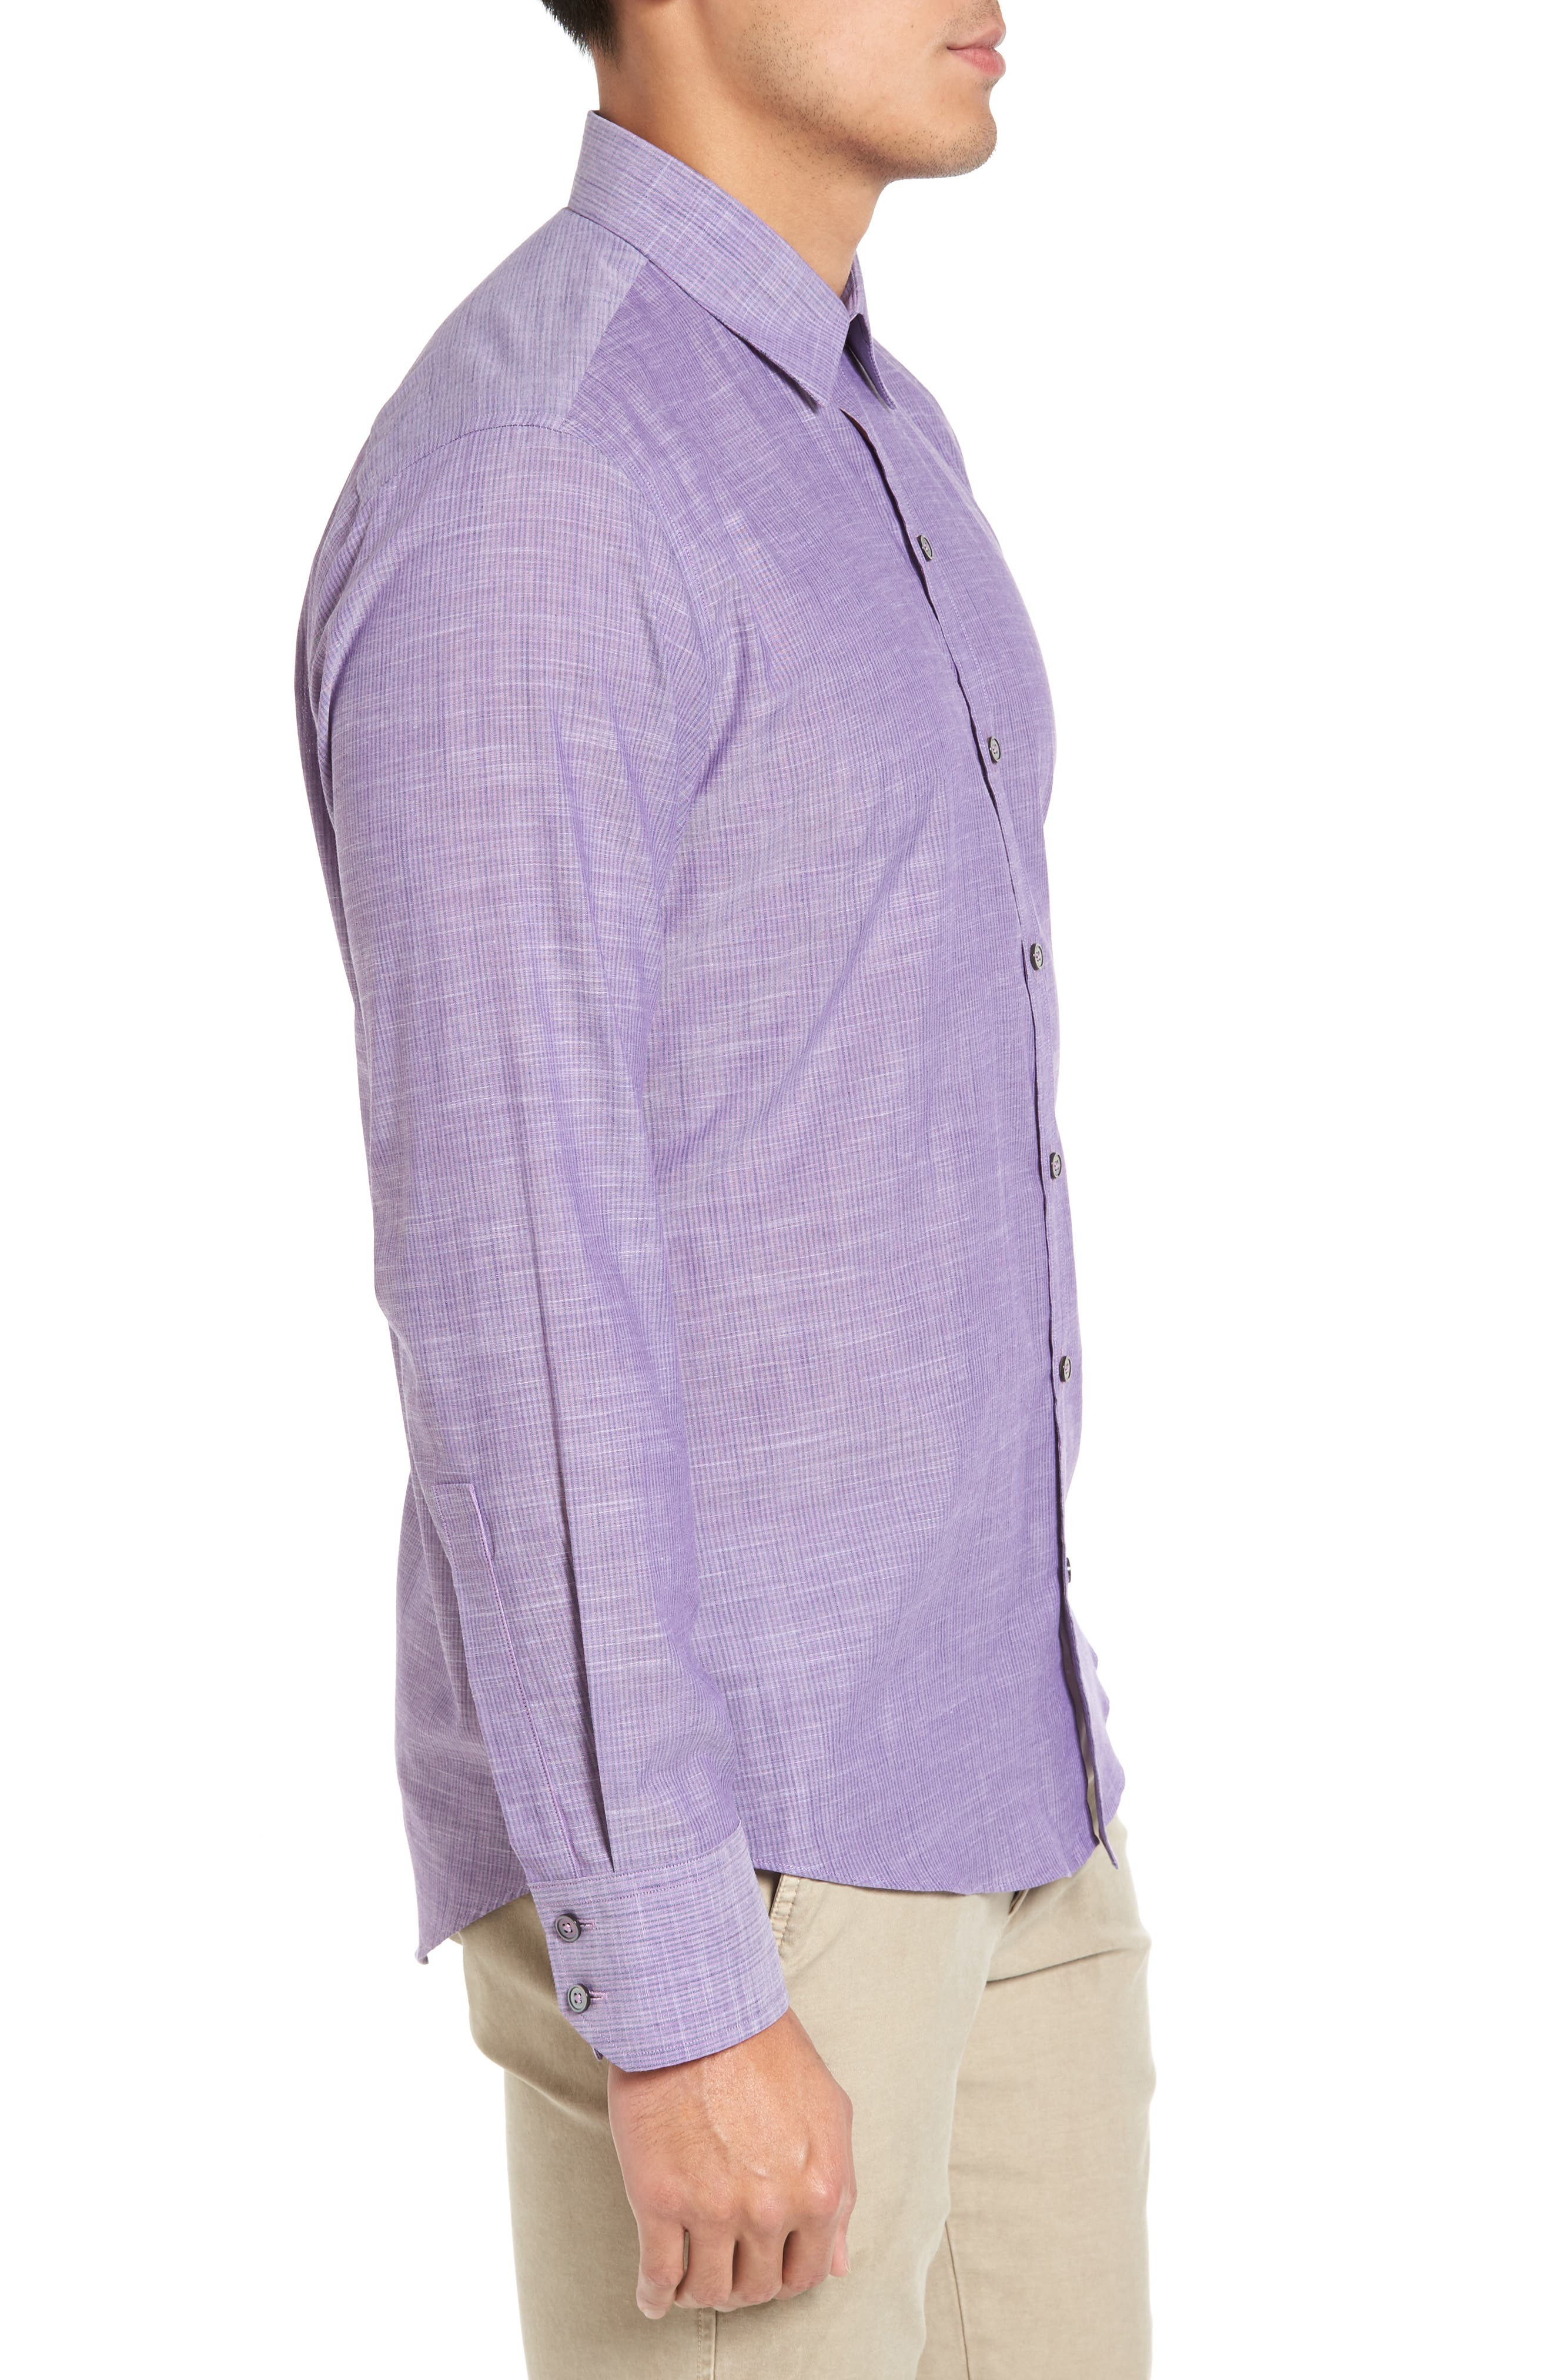 Snower Slim Fit Sport Shirt,                             Alternate thumbnail 3, color,                             500